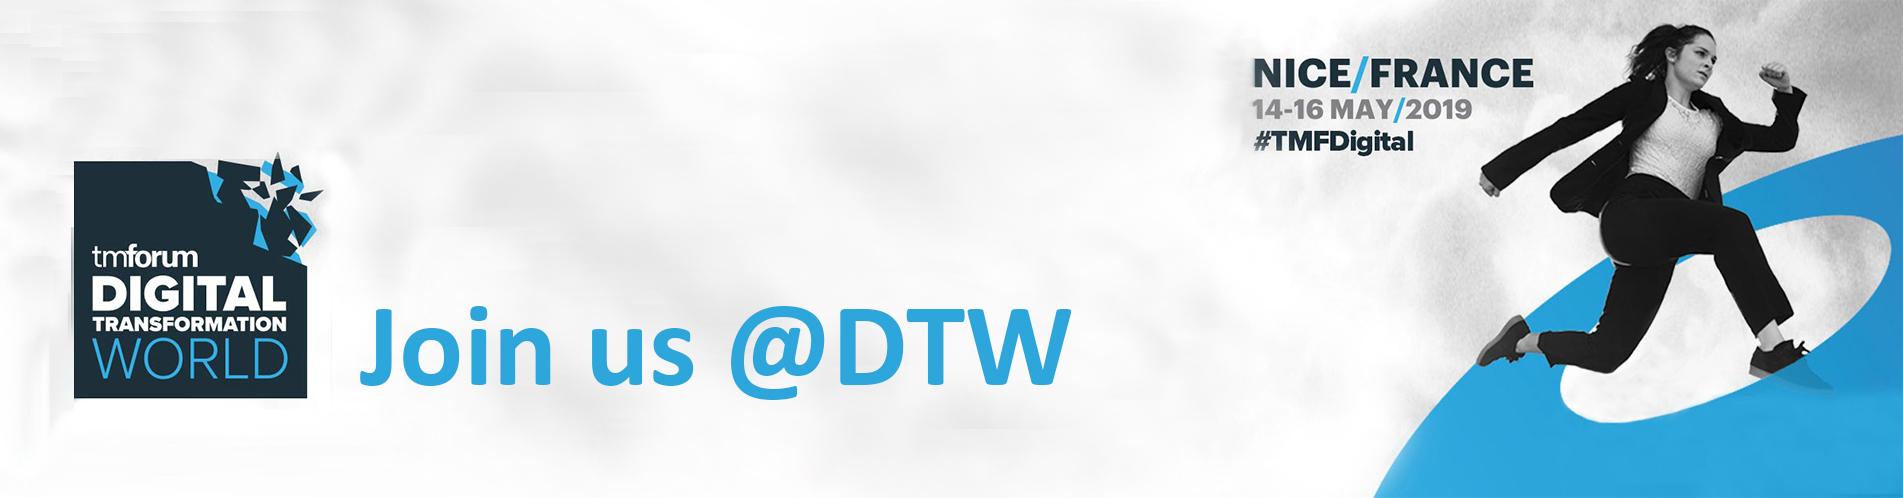 Join us at Digital Transformation World